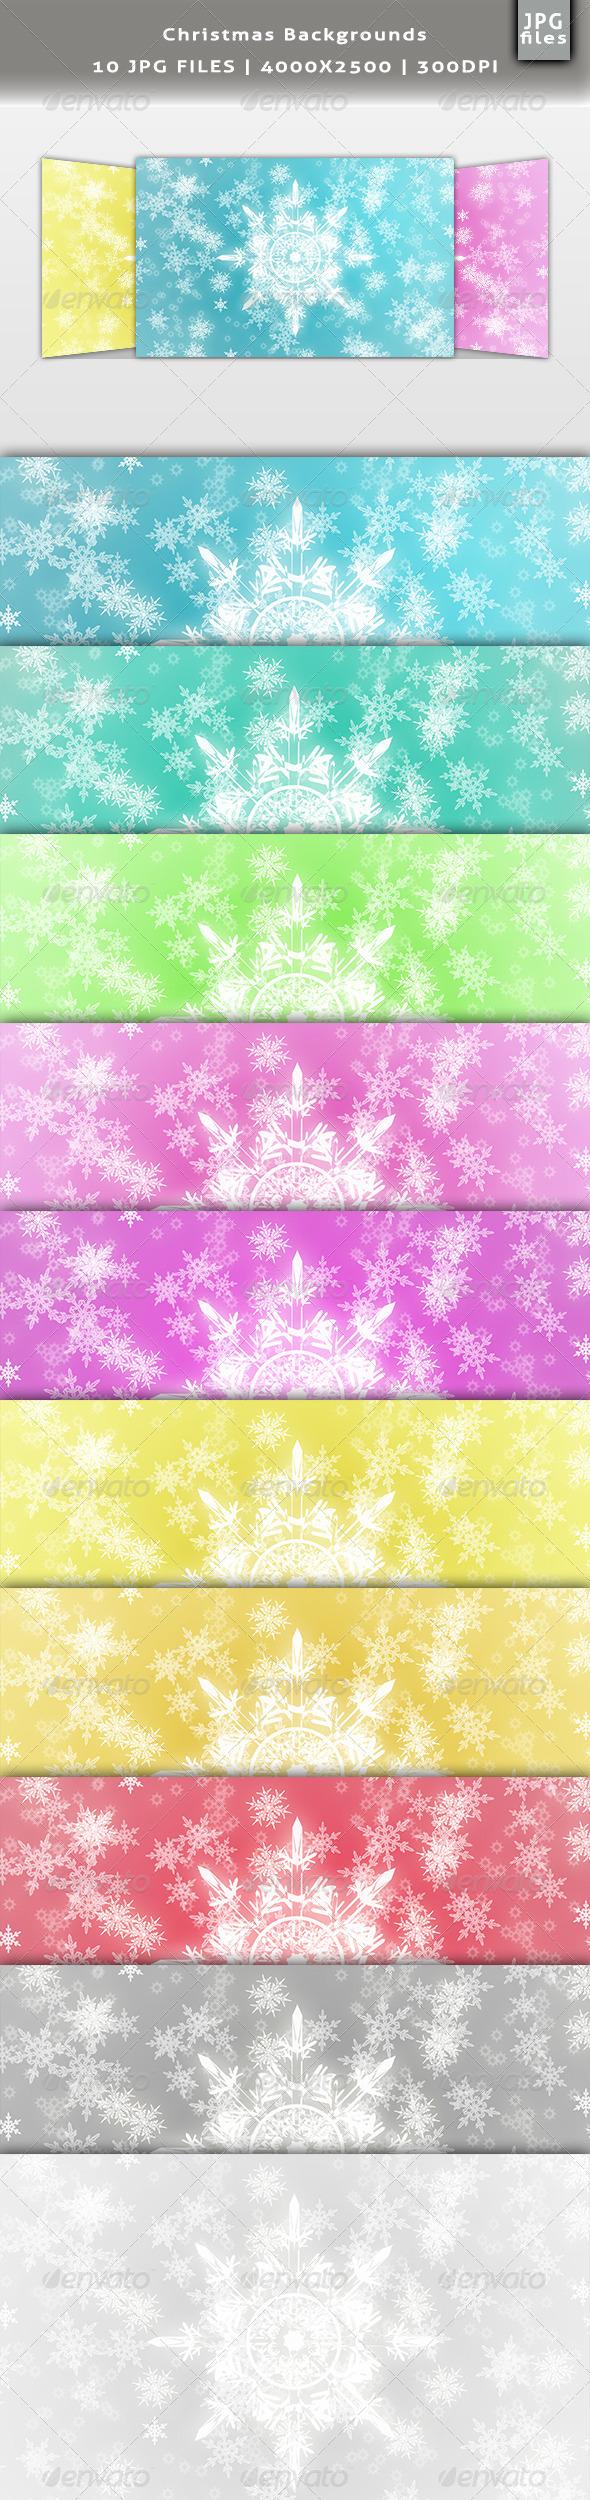 Christmas Backgrounds Set - Miscellaneous Backgrounds